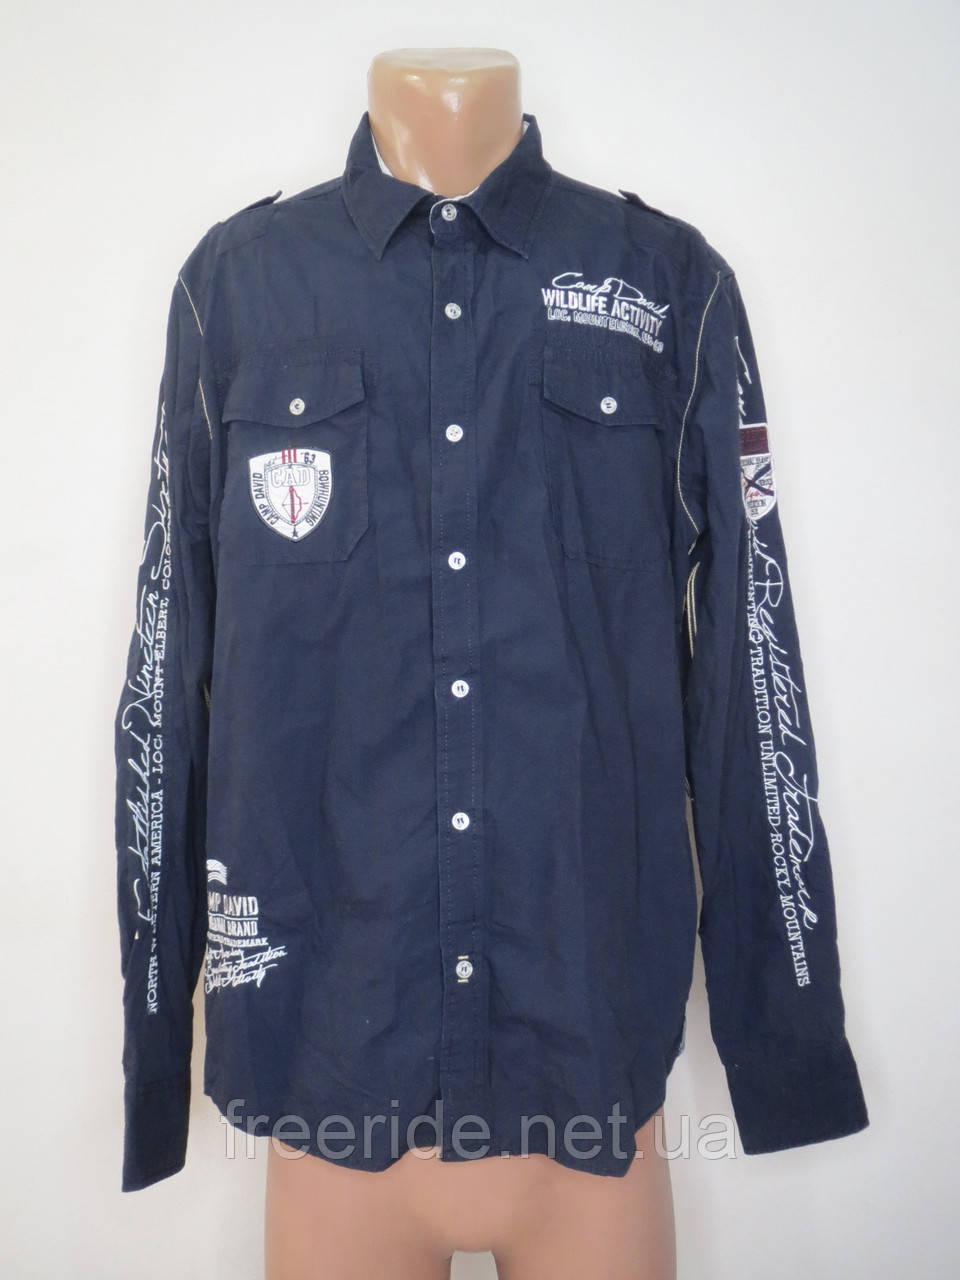 Фирменная рубашка Camp David (L)